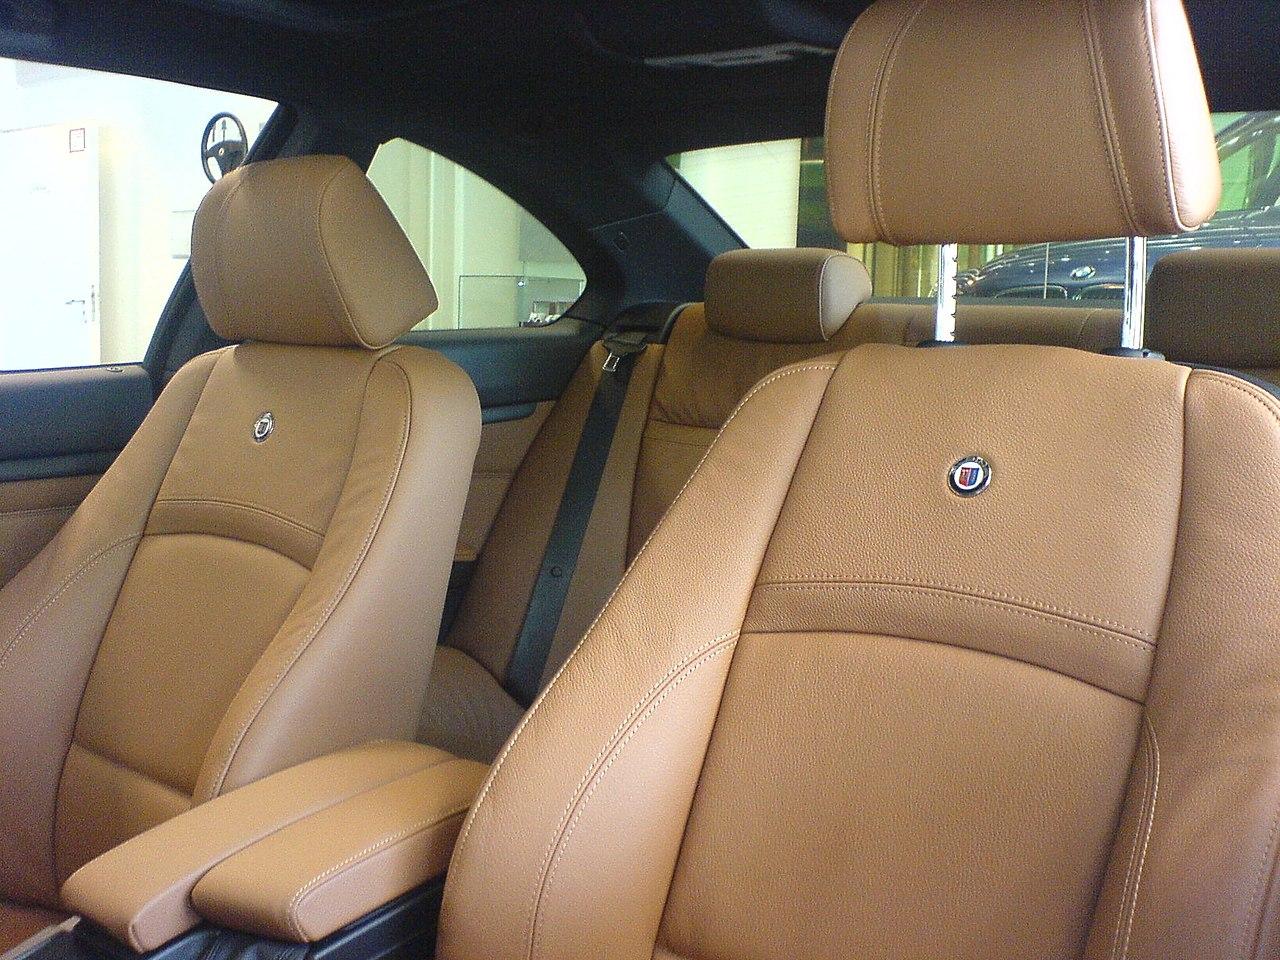 1280px-BMW_Alpina_B3_Biturbo_E92-Leder-Vordersitze_in_Dakota-braun